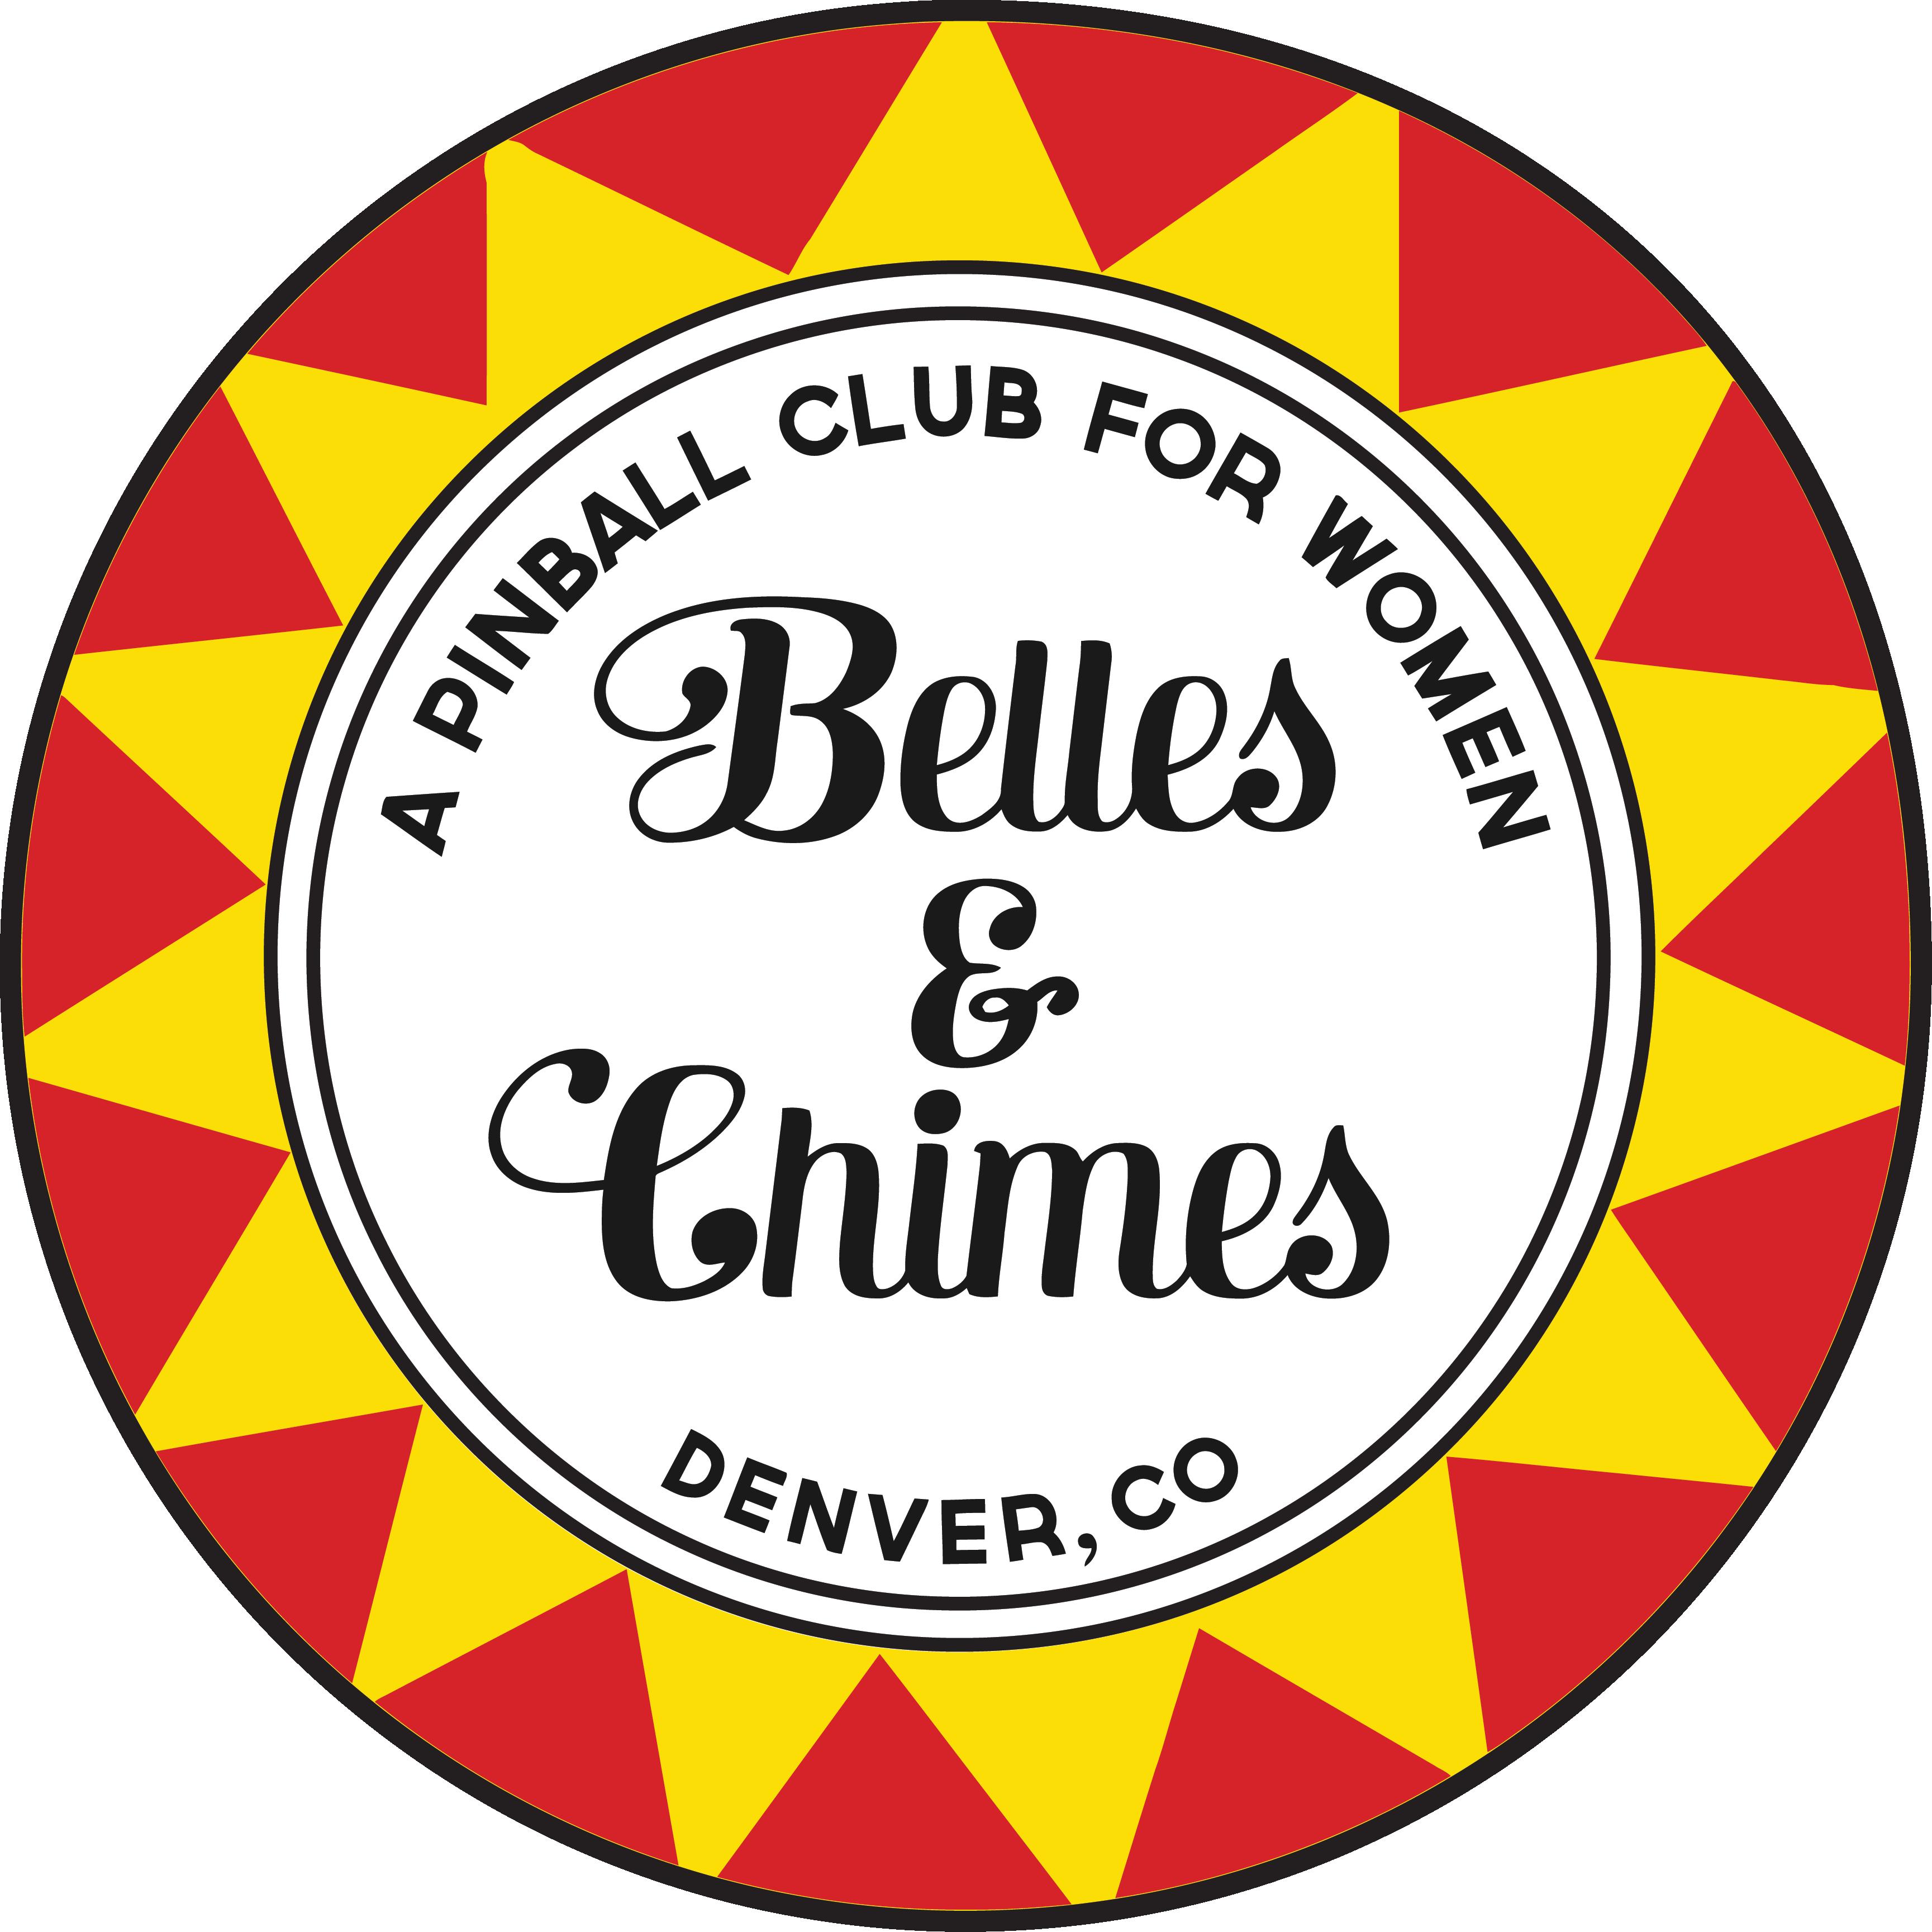 Belles & Chimes Denver